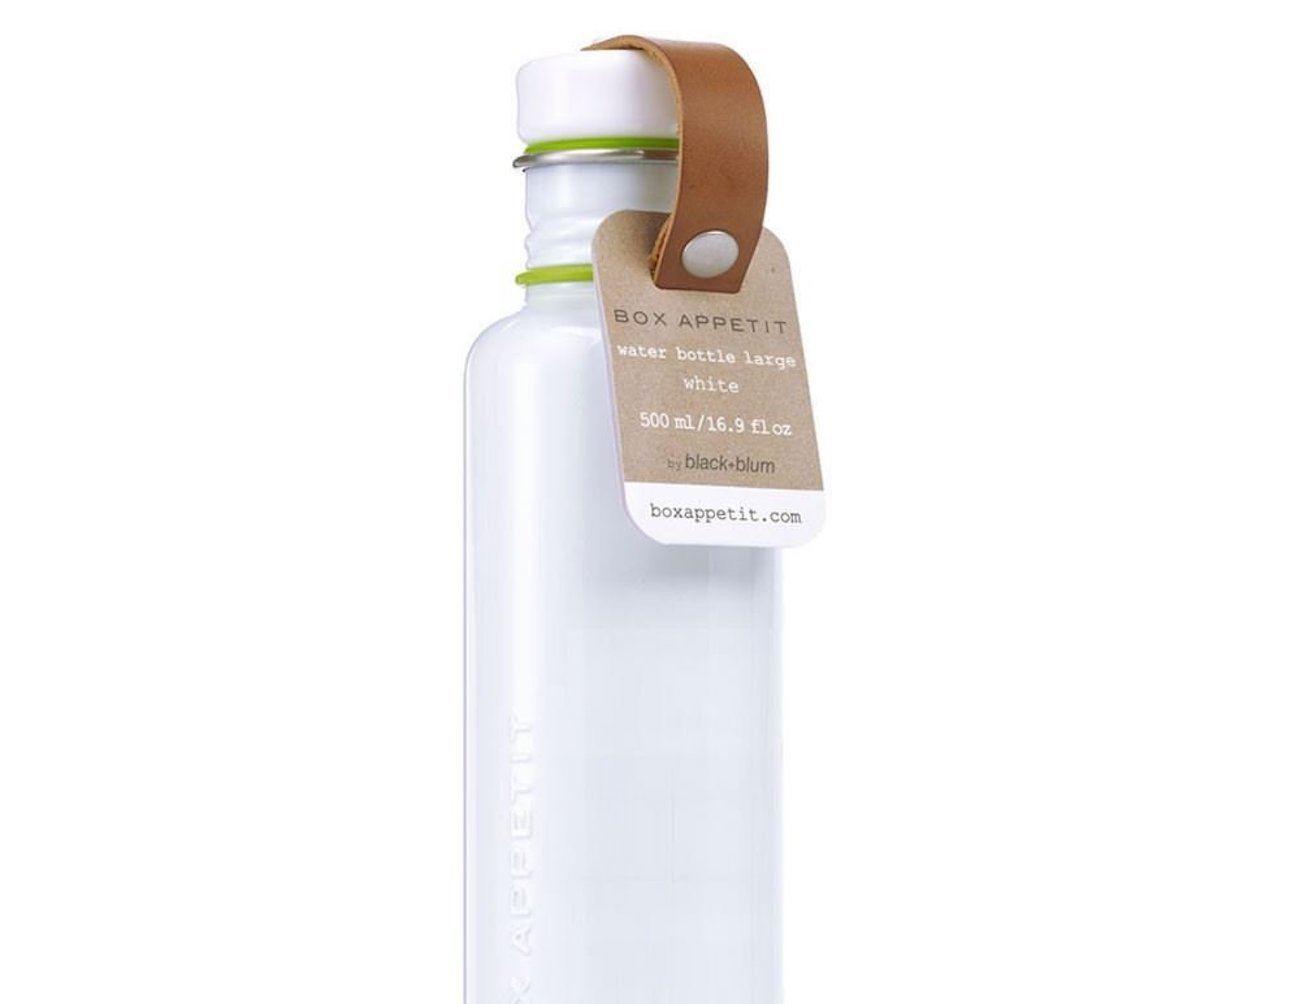 Box Appetit Stainless Steel Water Bottle